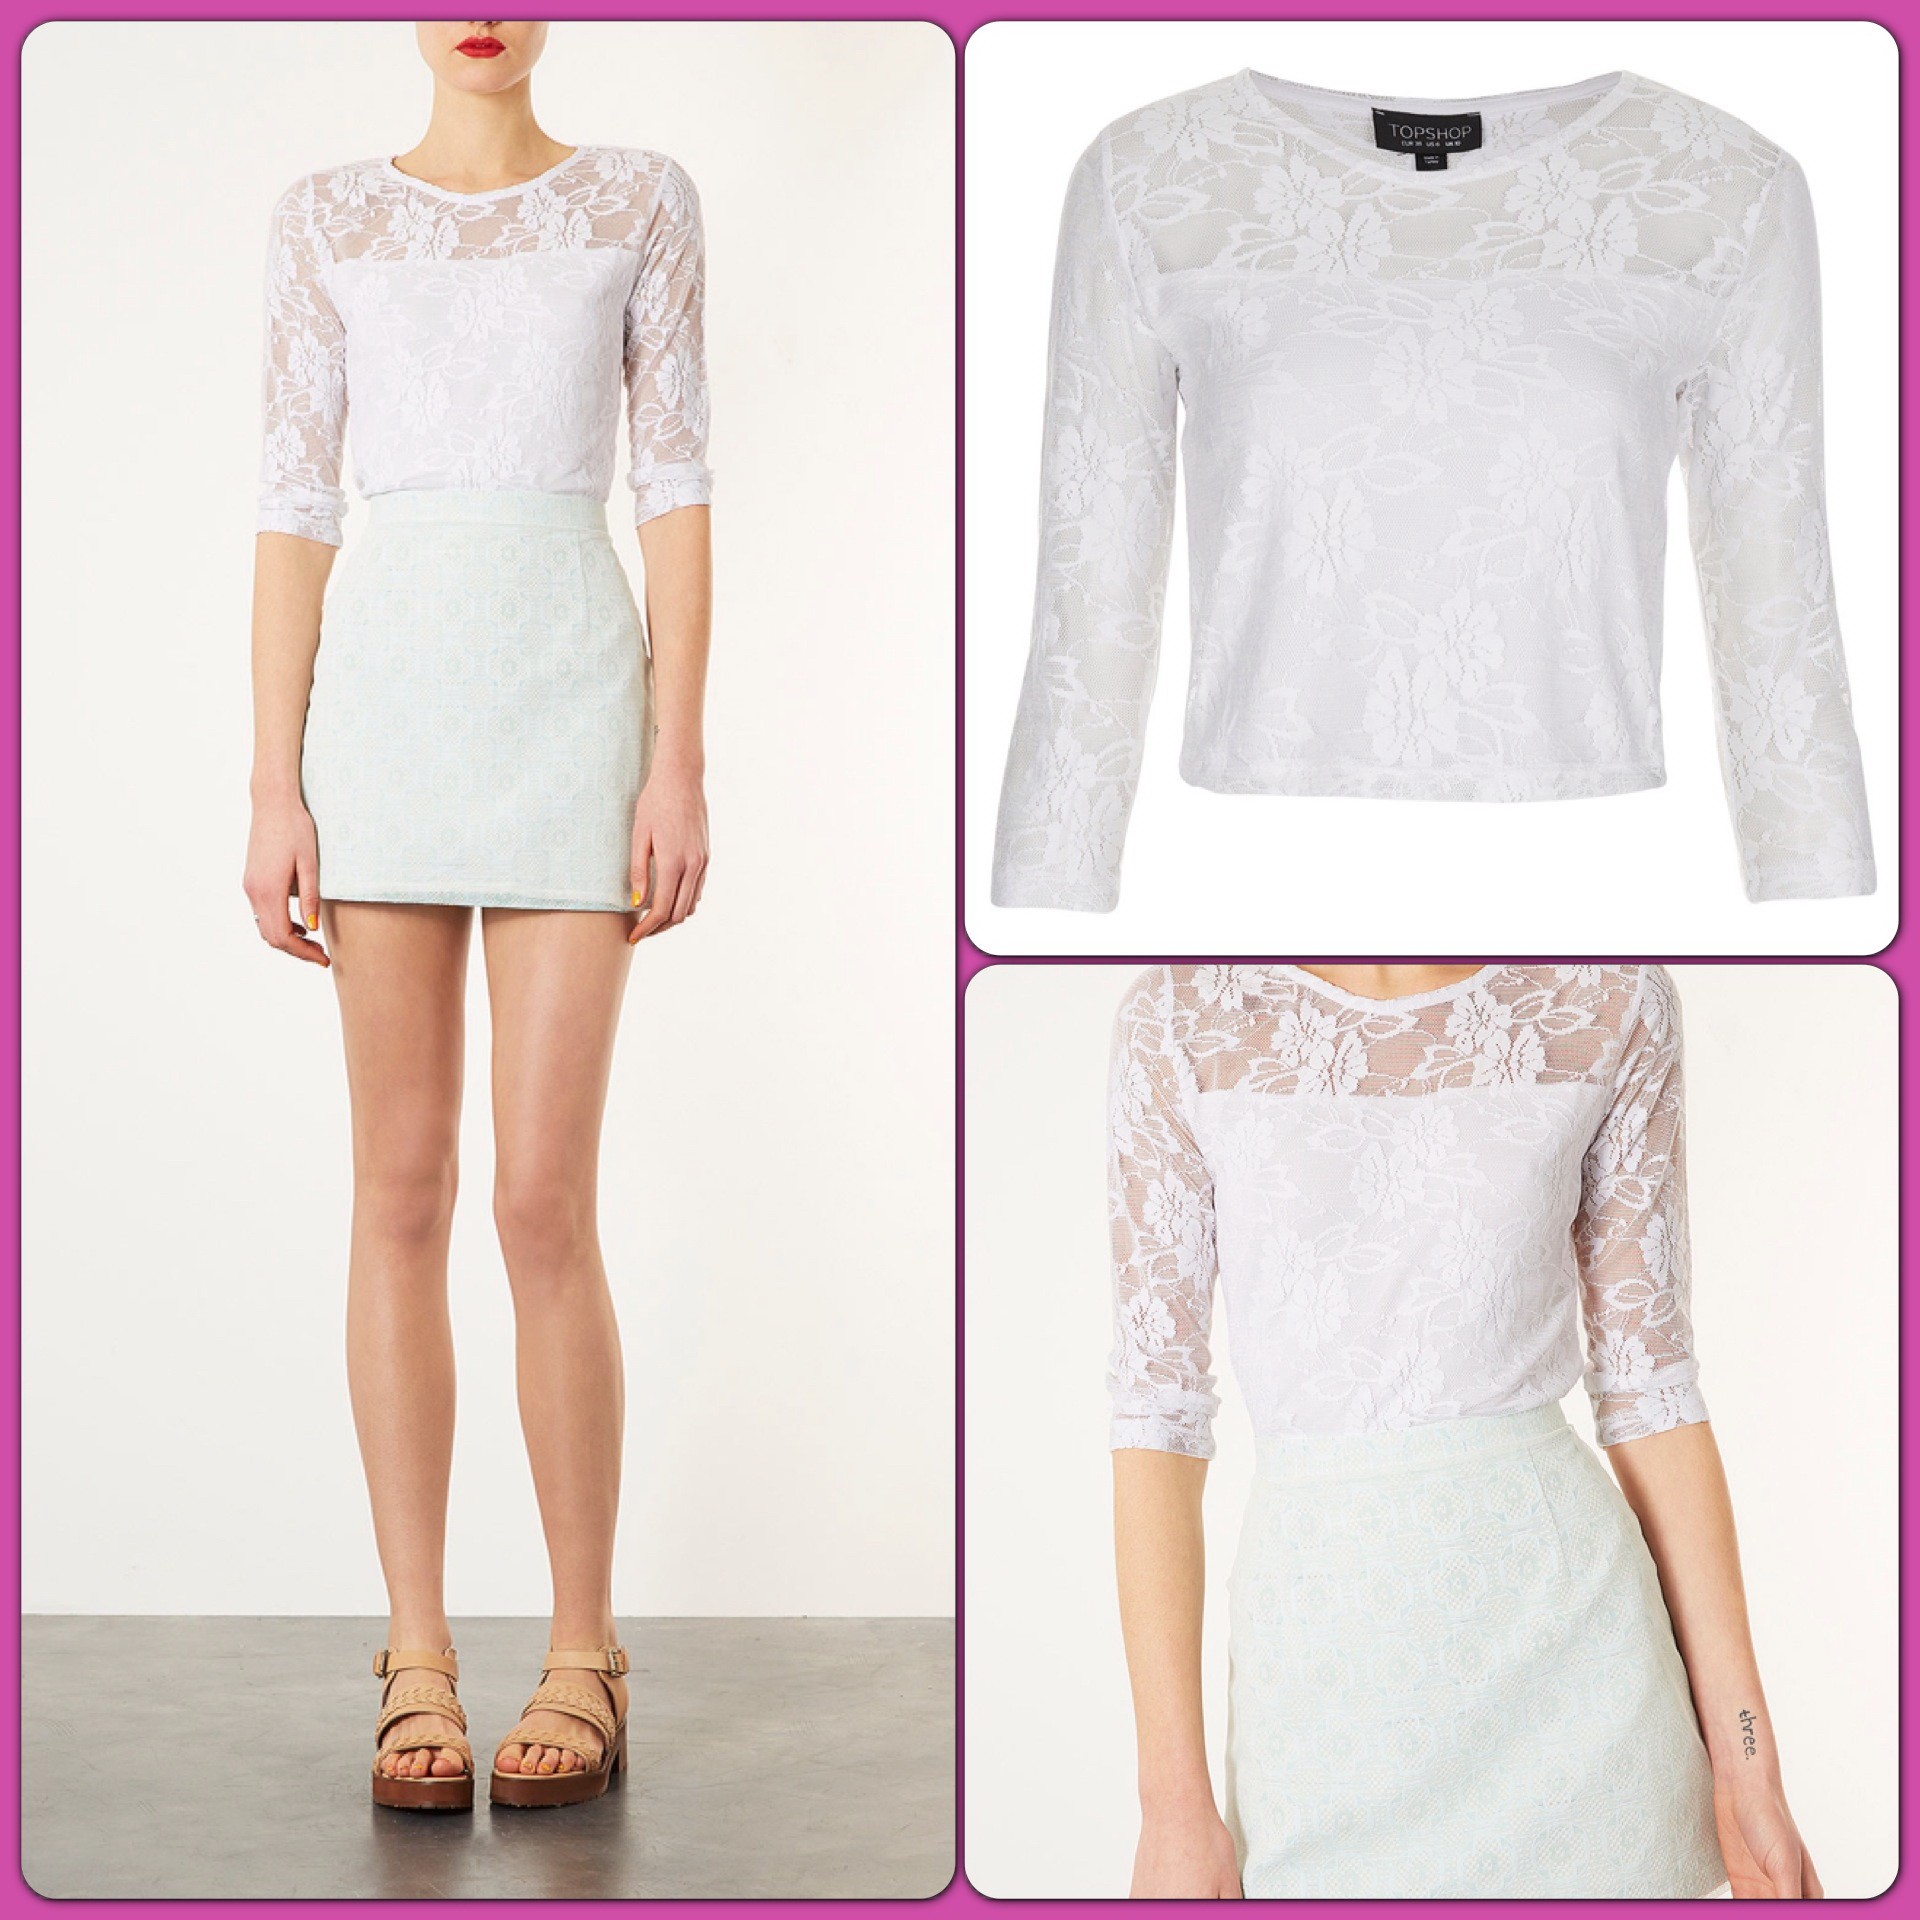 Topshop Lace Top Size uk8-10